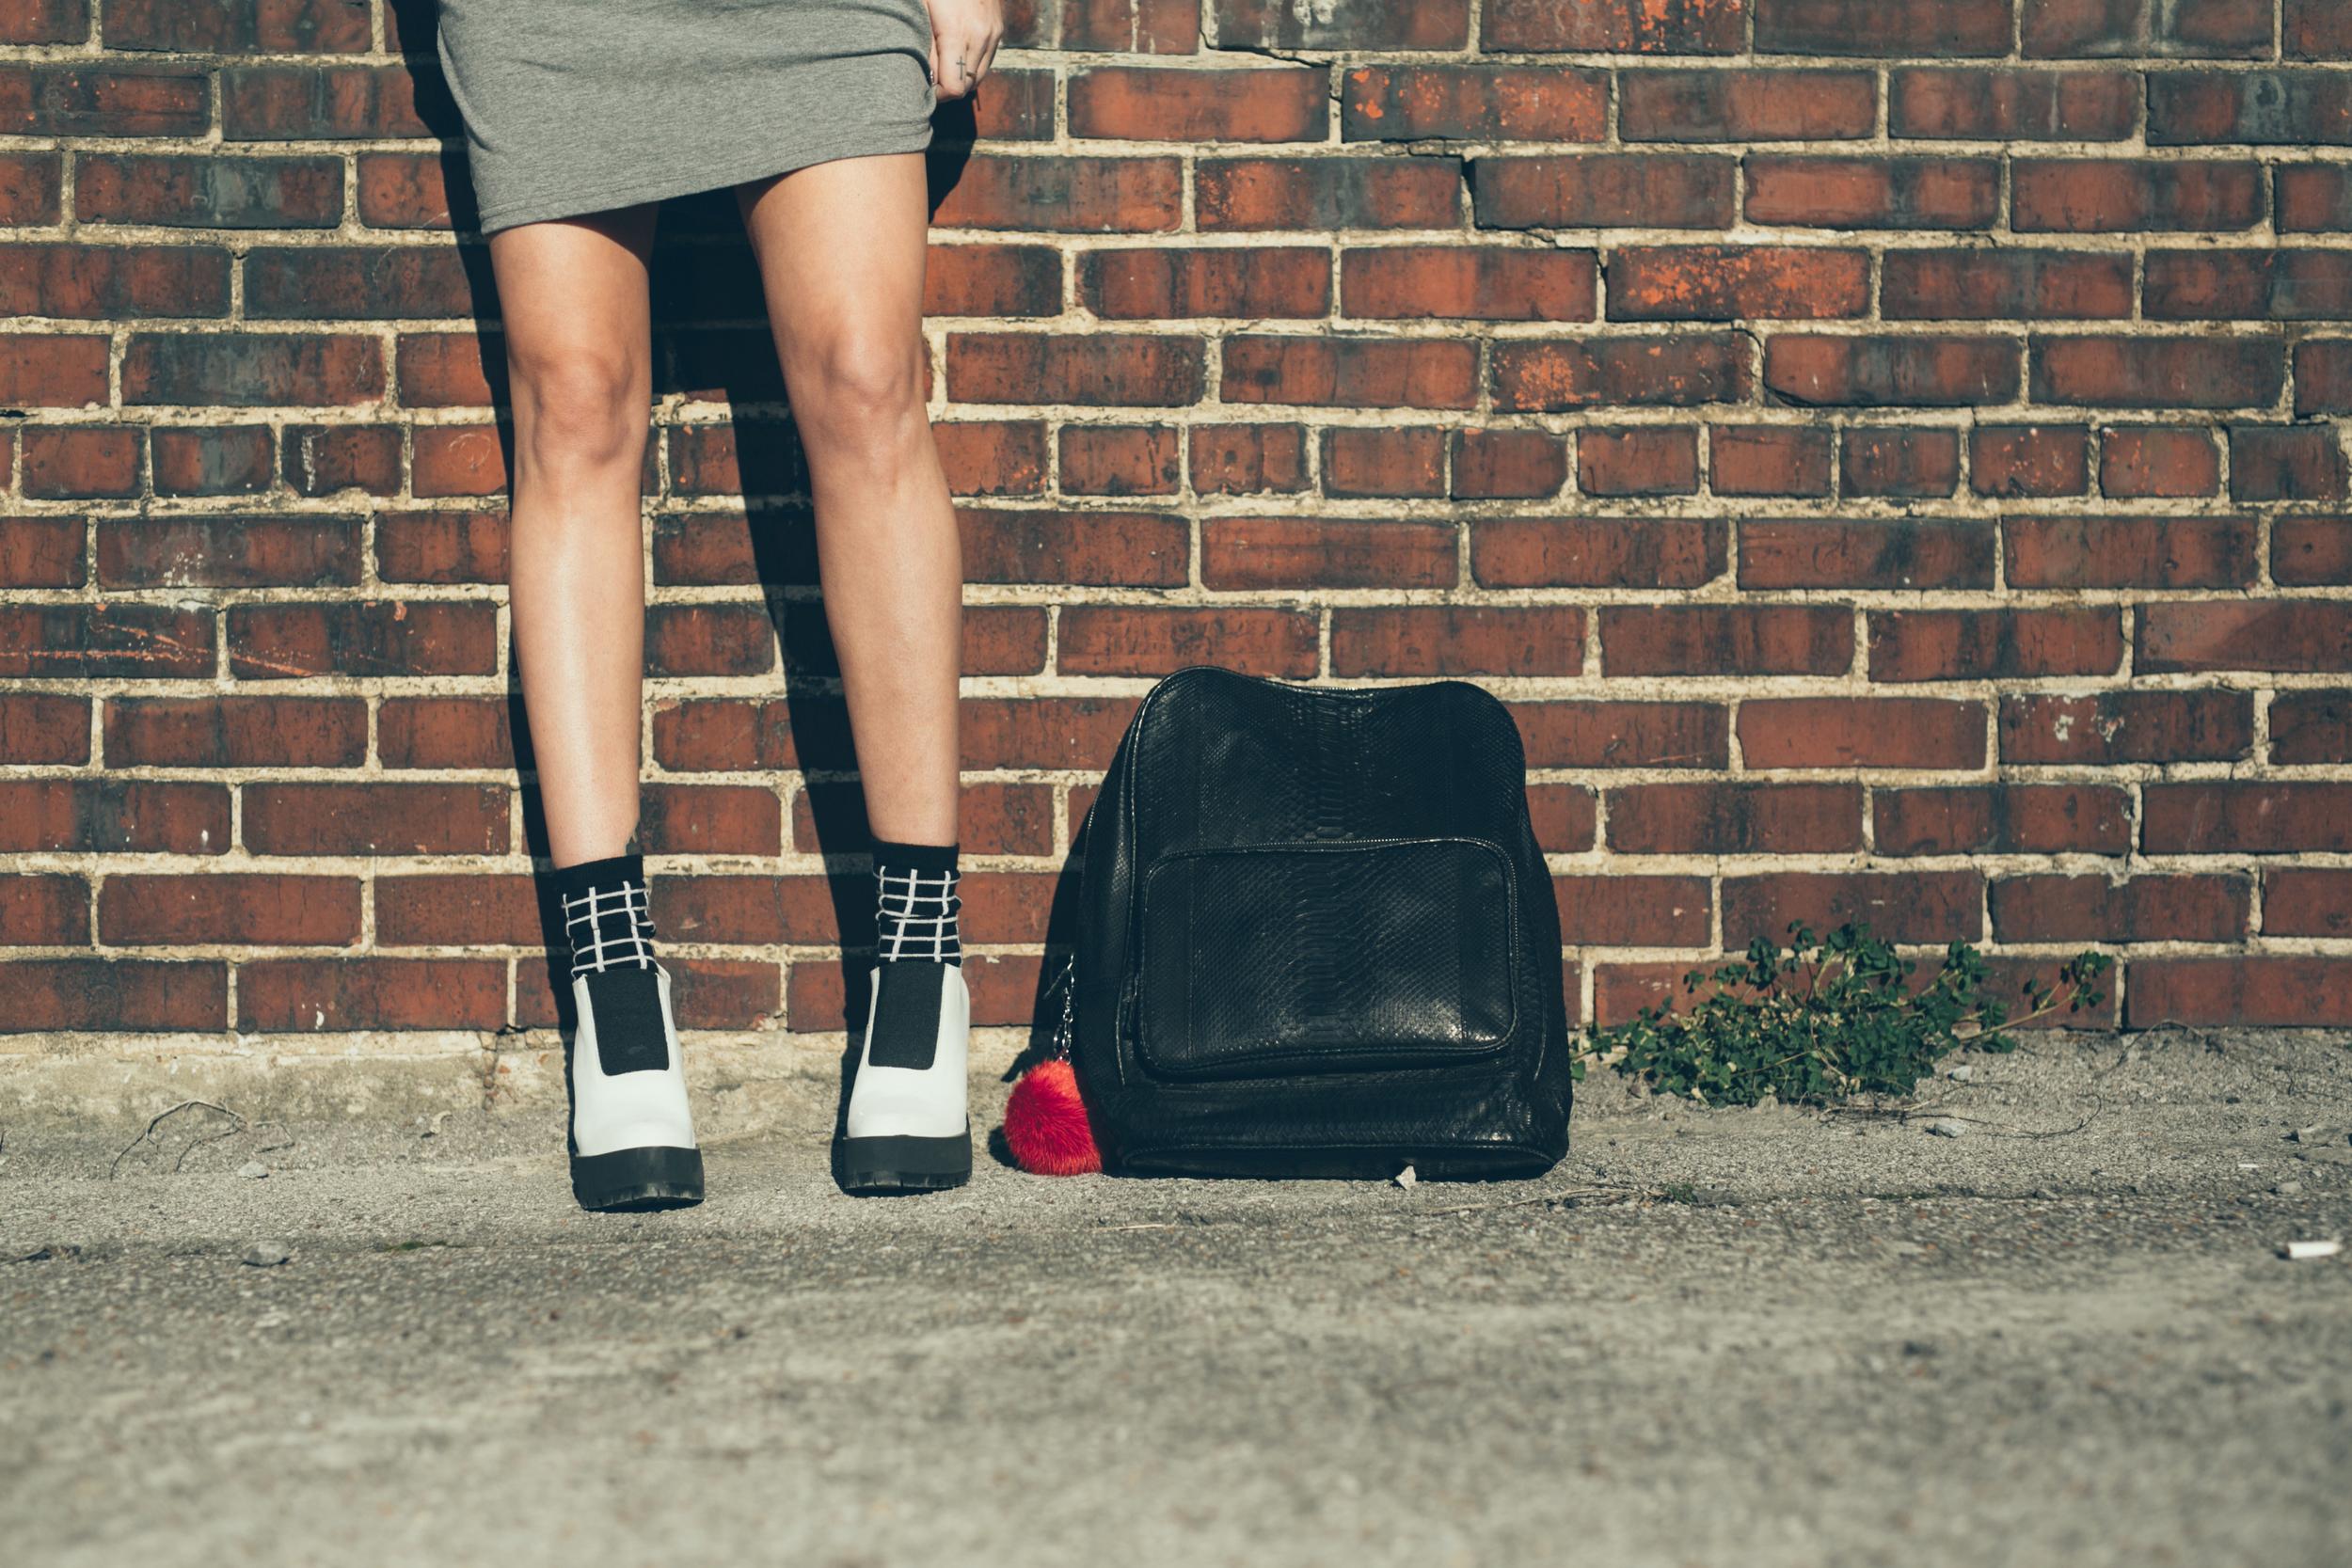 Dress -  Brandi Cyrus for Valley City  |  Jacket - Reformation  | Shoes - Miista | Bag - Gelareh Mizrahi | Socks - TopShop